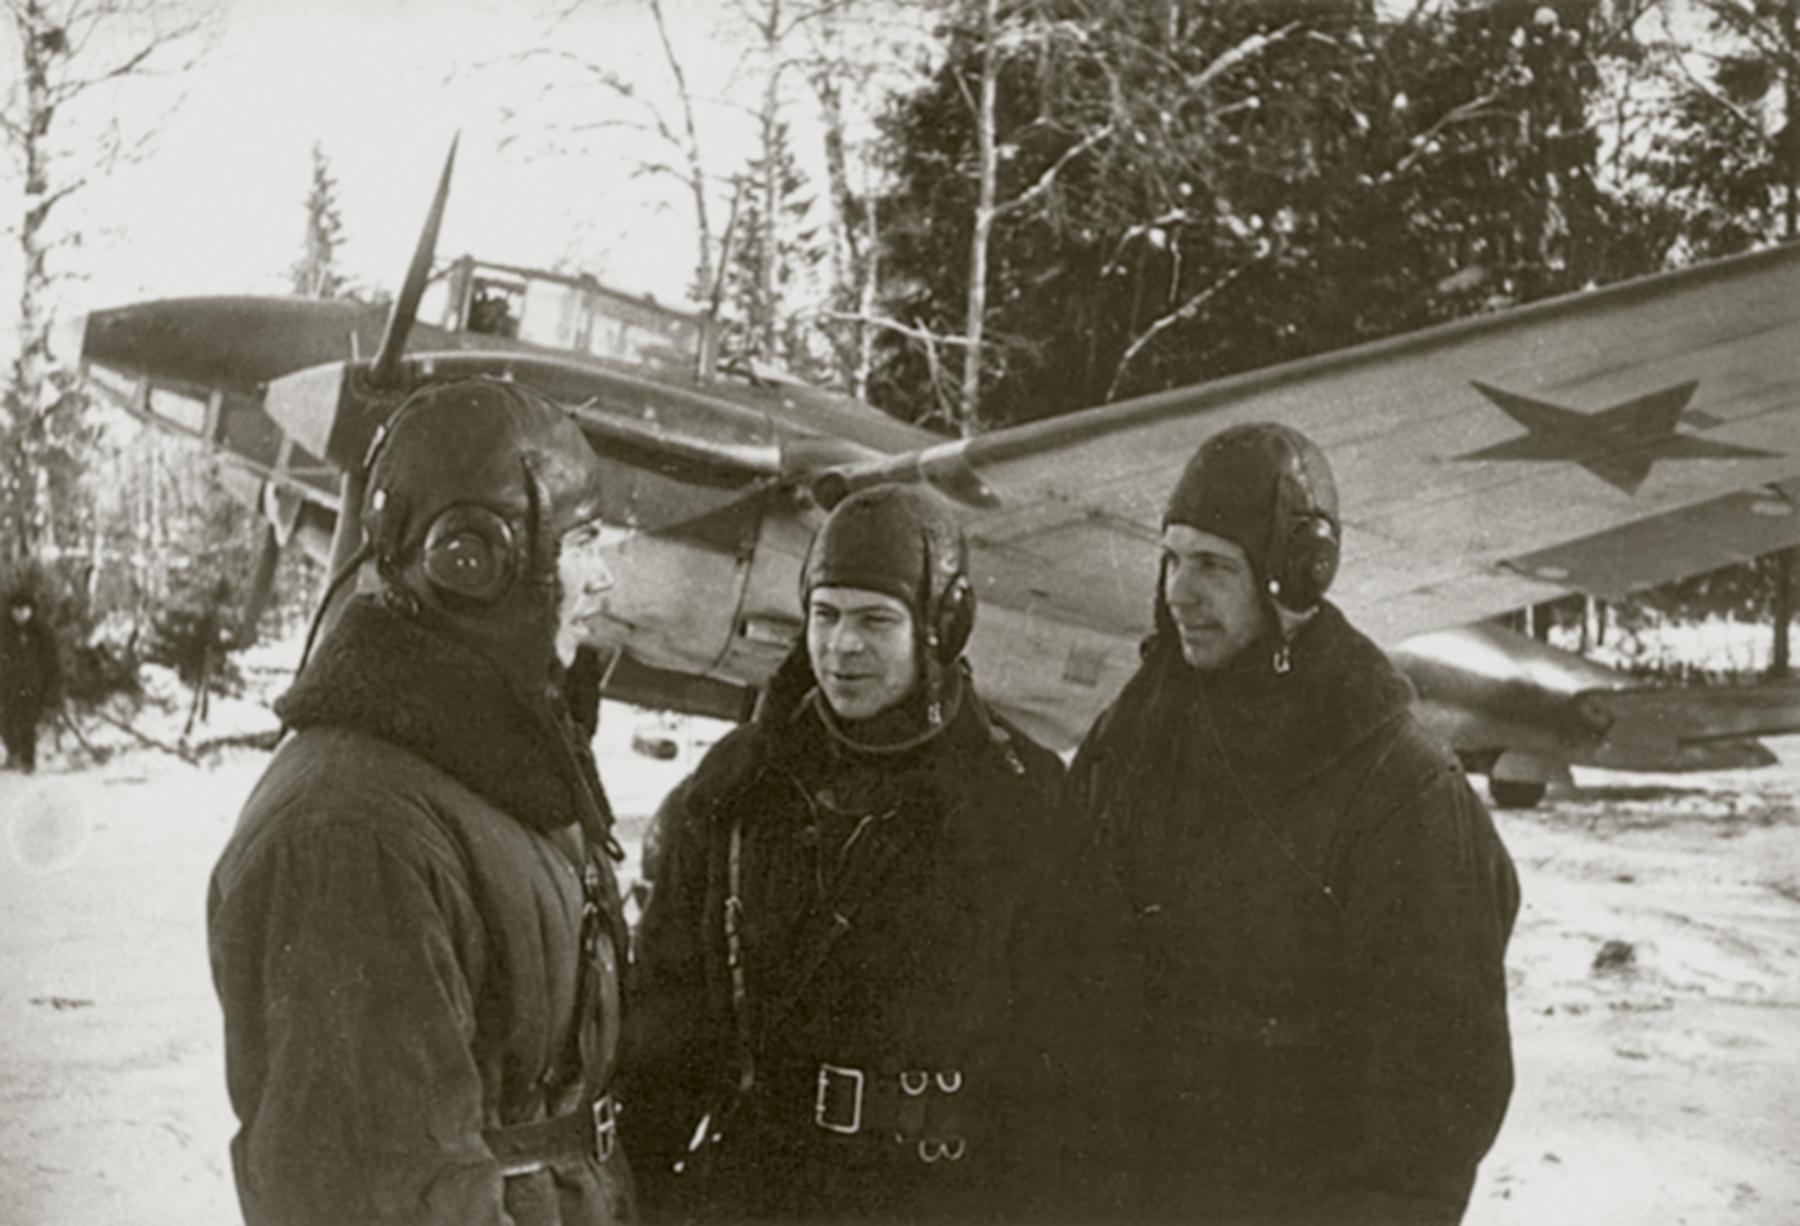 Aircrew Soviet 11ORAP Cmdr Lt P Shinkarev (center) 01